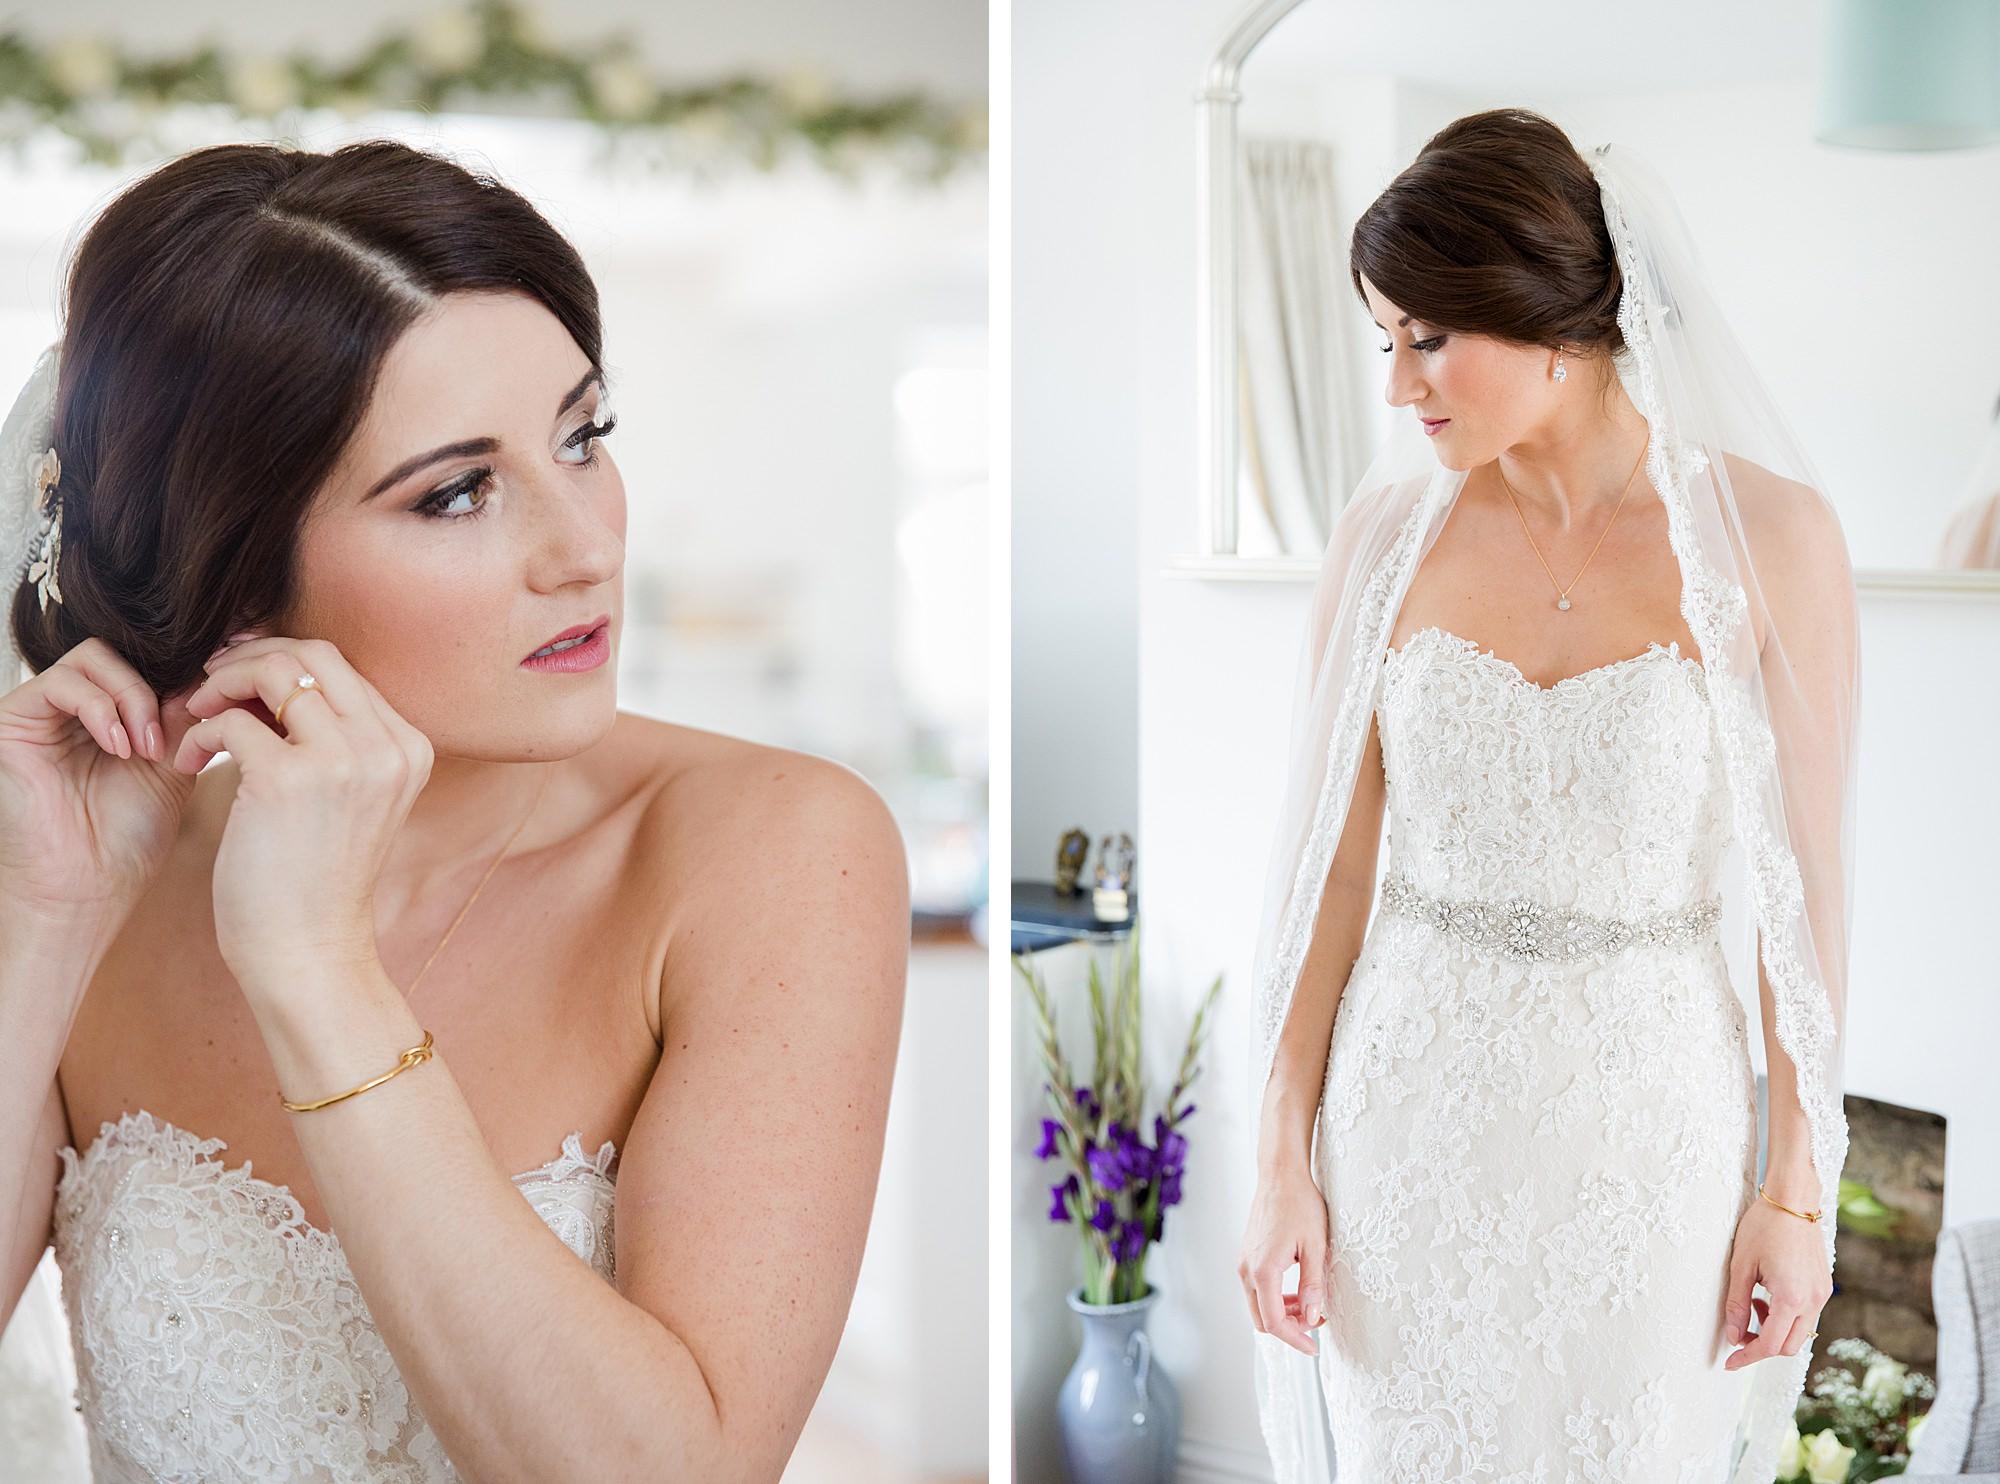 Lillibrooke Manor wedding portrait of bride putting on earrings